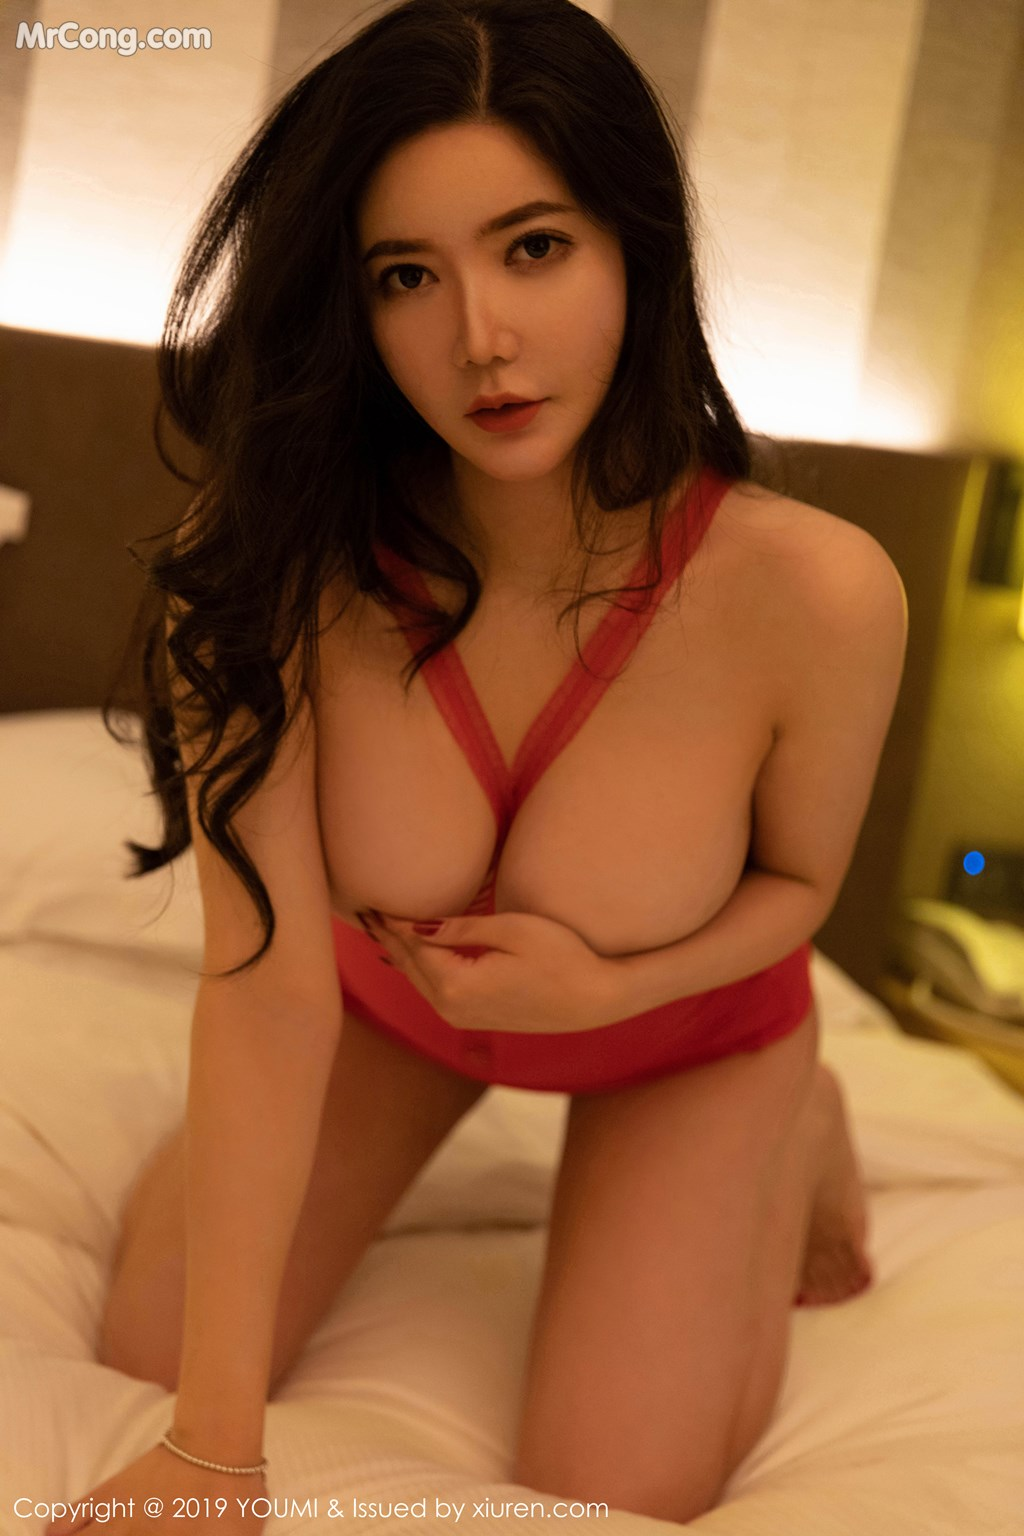 Image YouMi-Vol.310-MrCong.com-009 in post YouMi Vol.310: 心妍小公主 (44 ảnh)